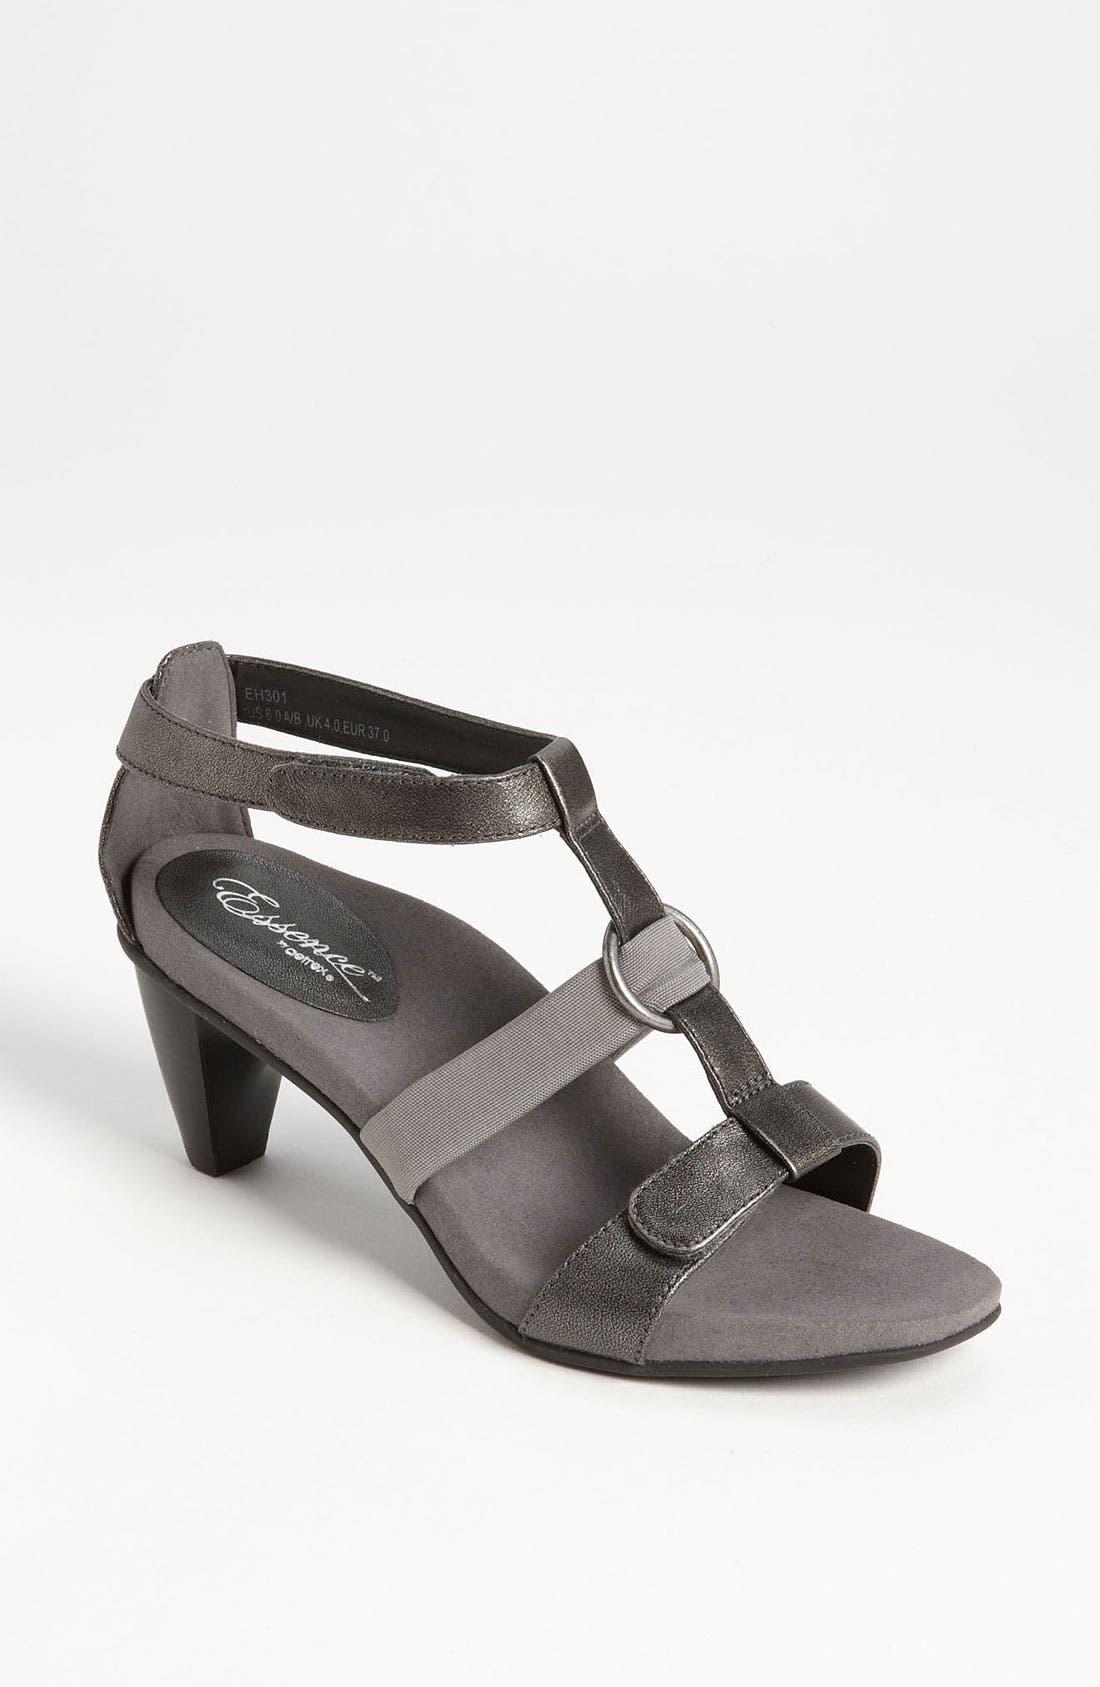 Alternate Image 1 Selected - Aetrex 'Sofia' Sandal